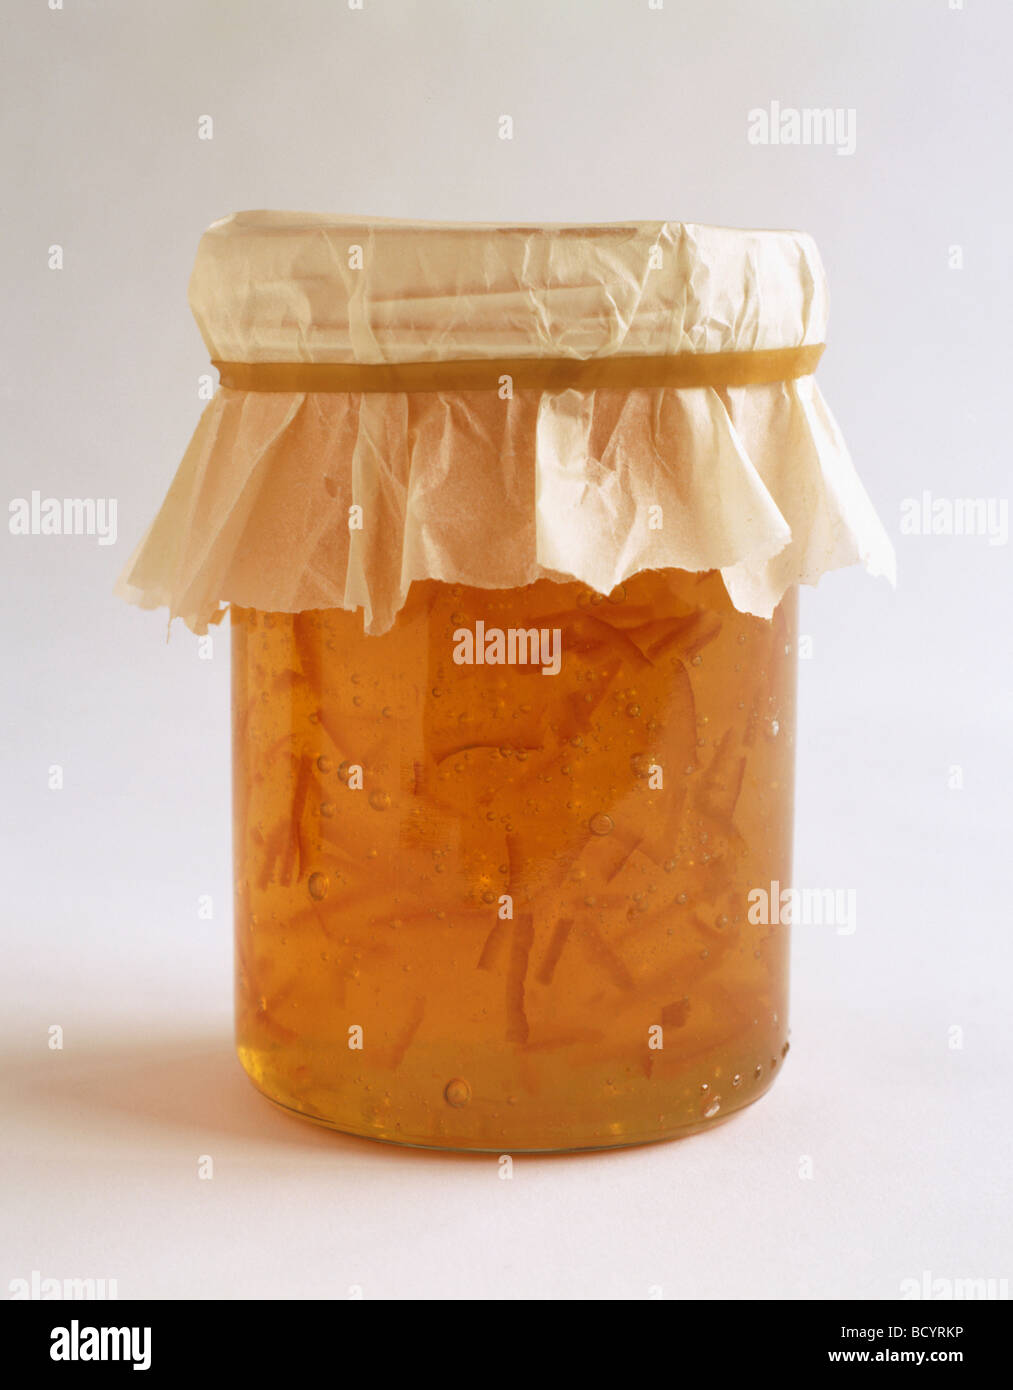 Food - jar of homemade marmalade